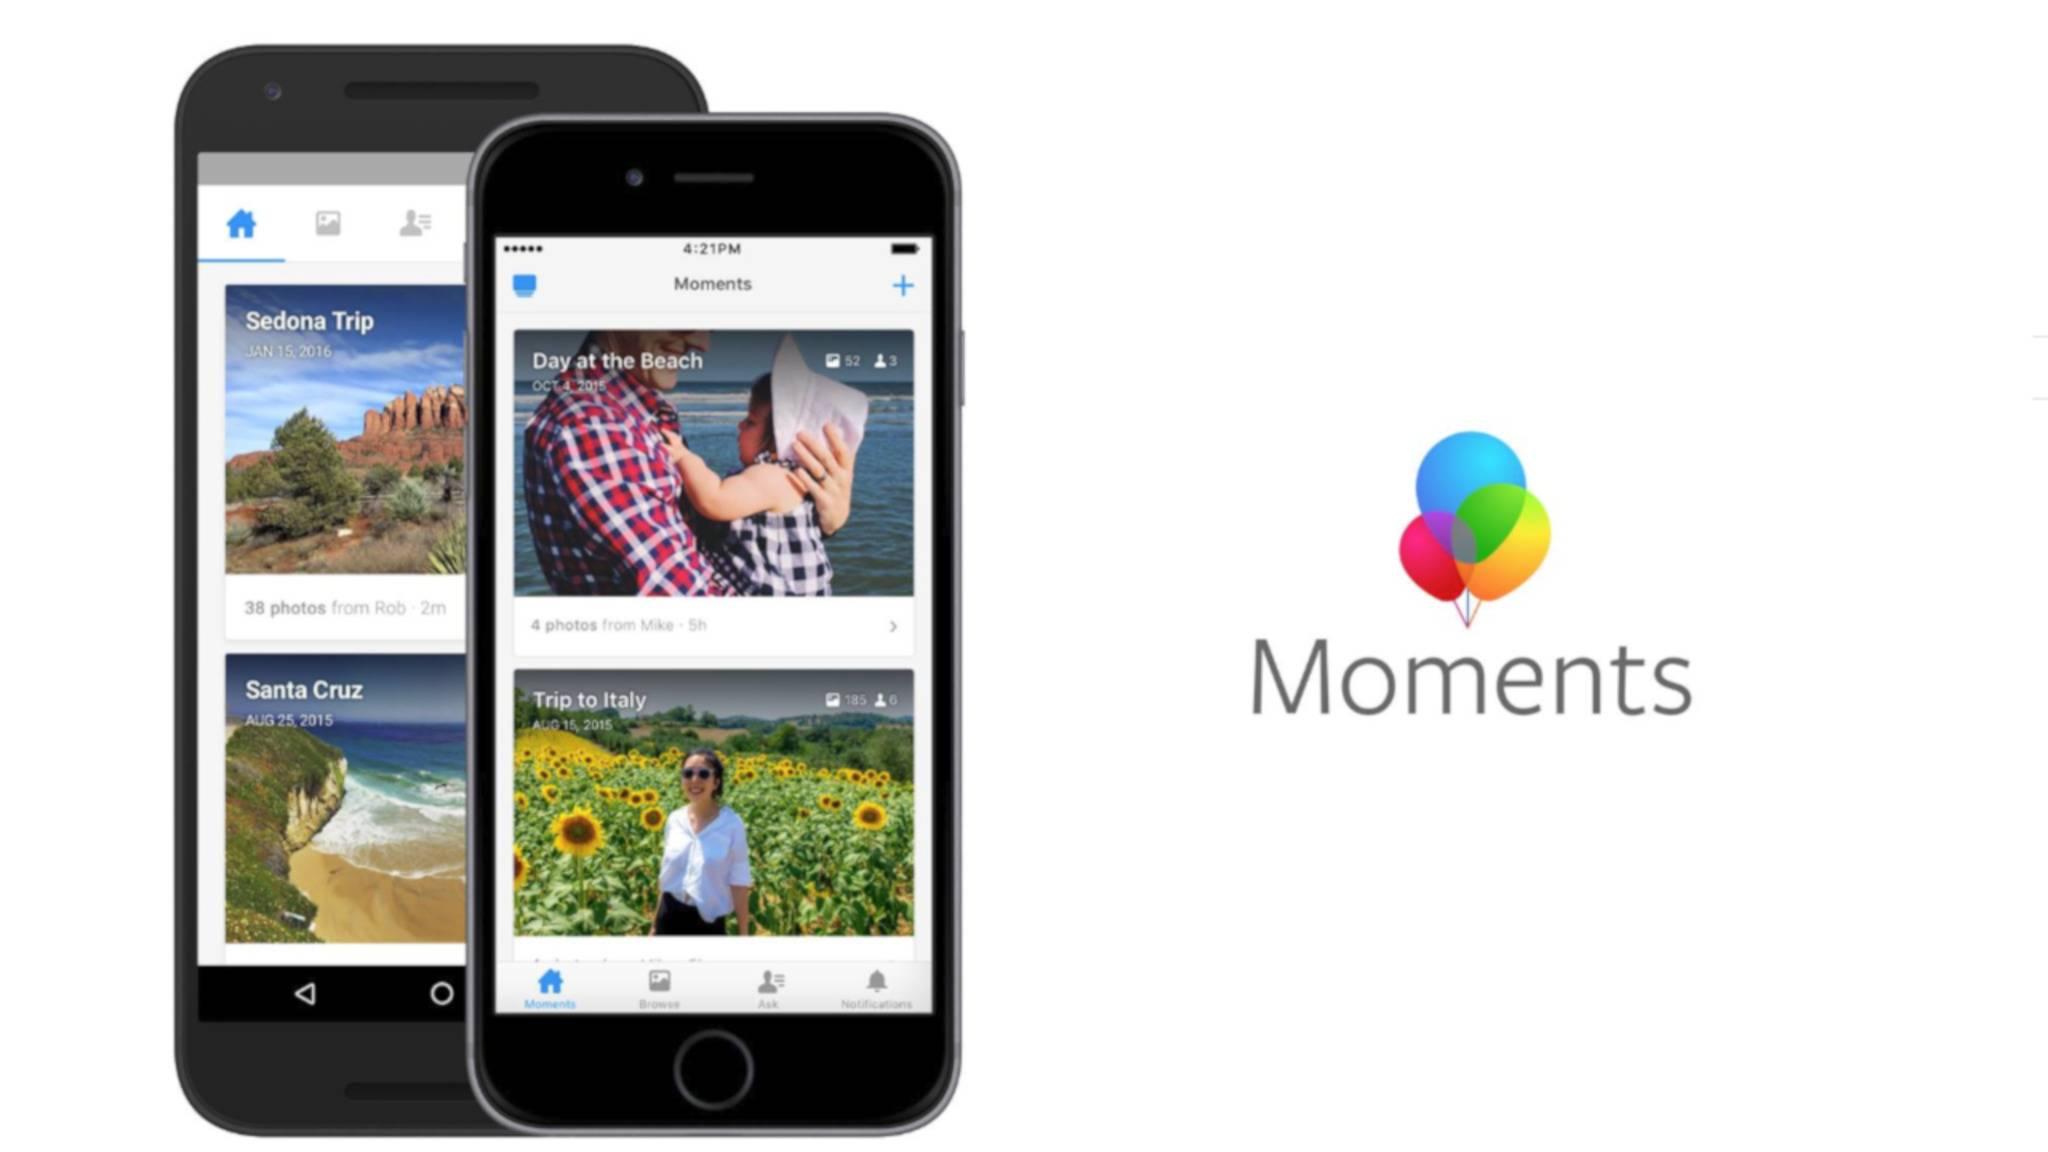 Facebook zieht den Stecker. Am 25. Februar wird die Moments-App dicht gemacht.